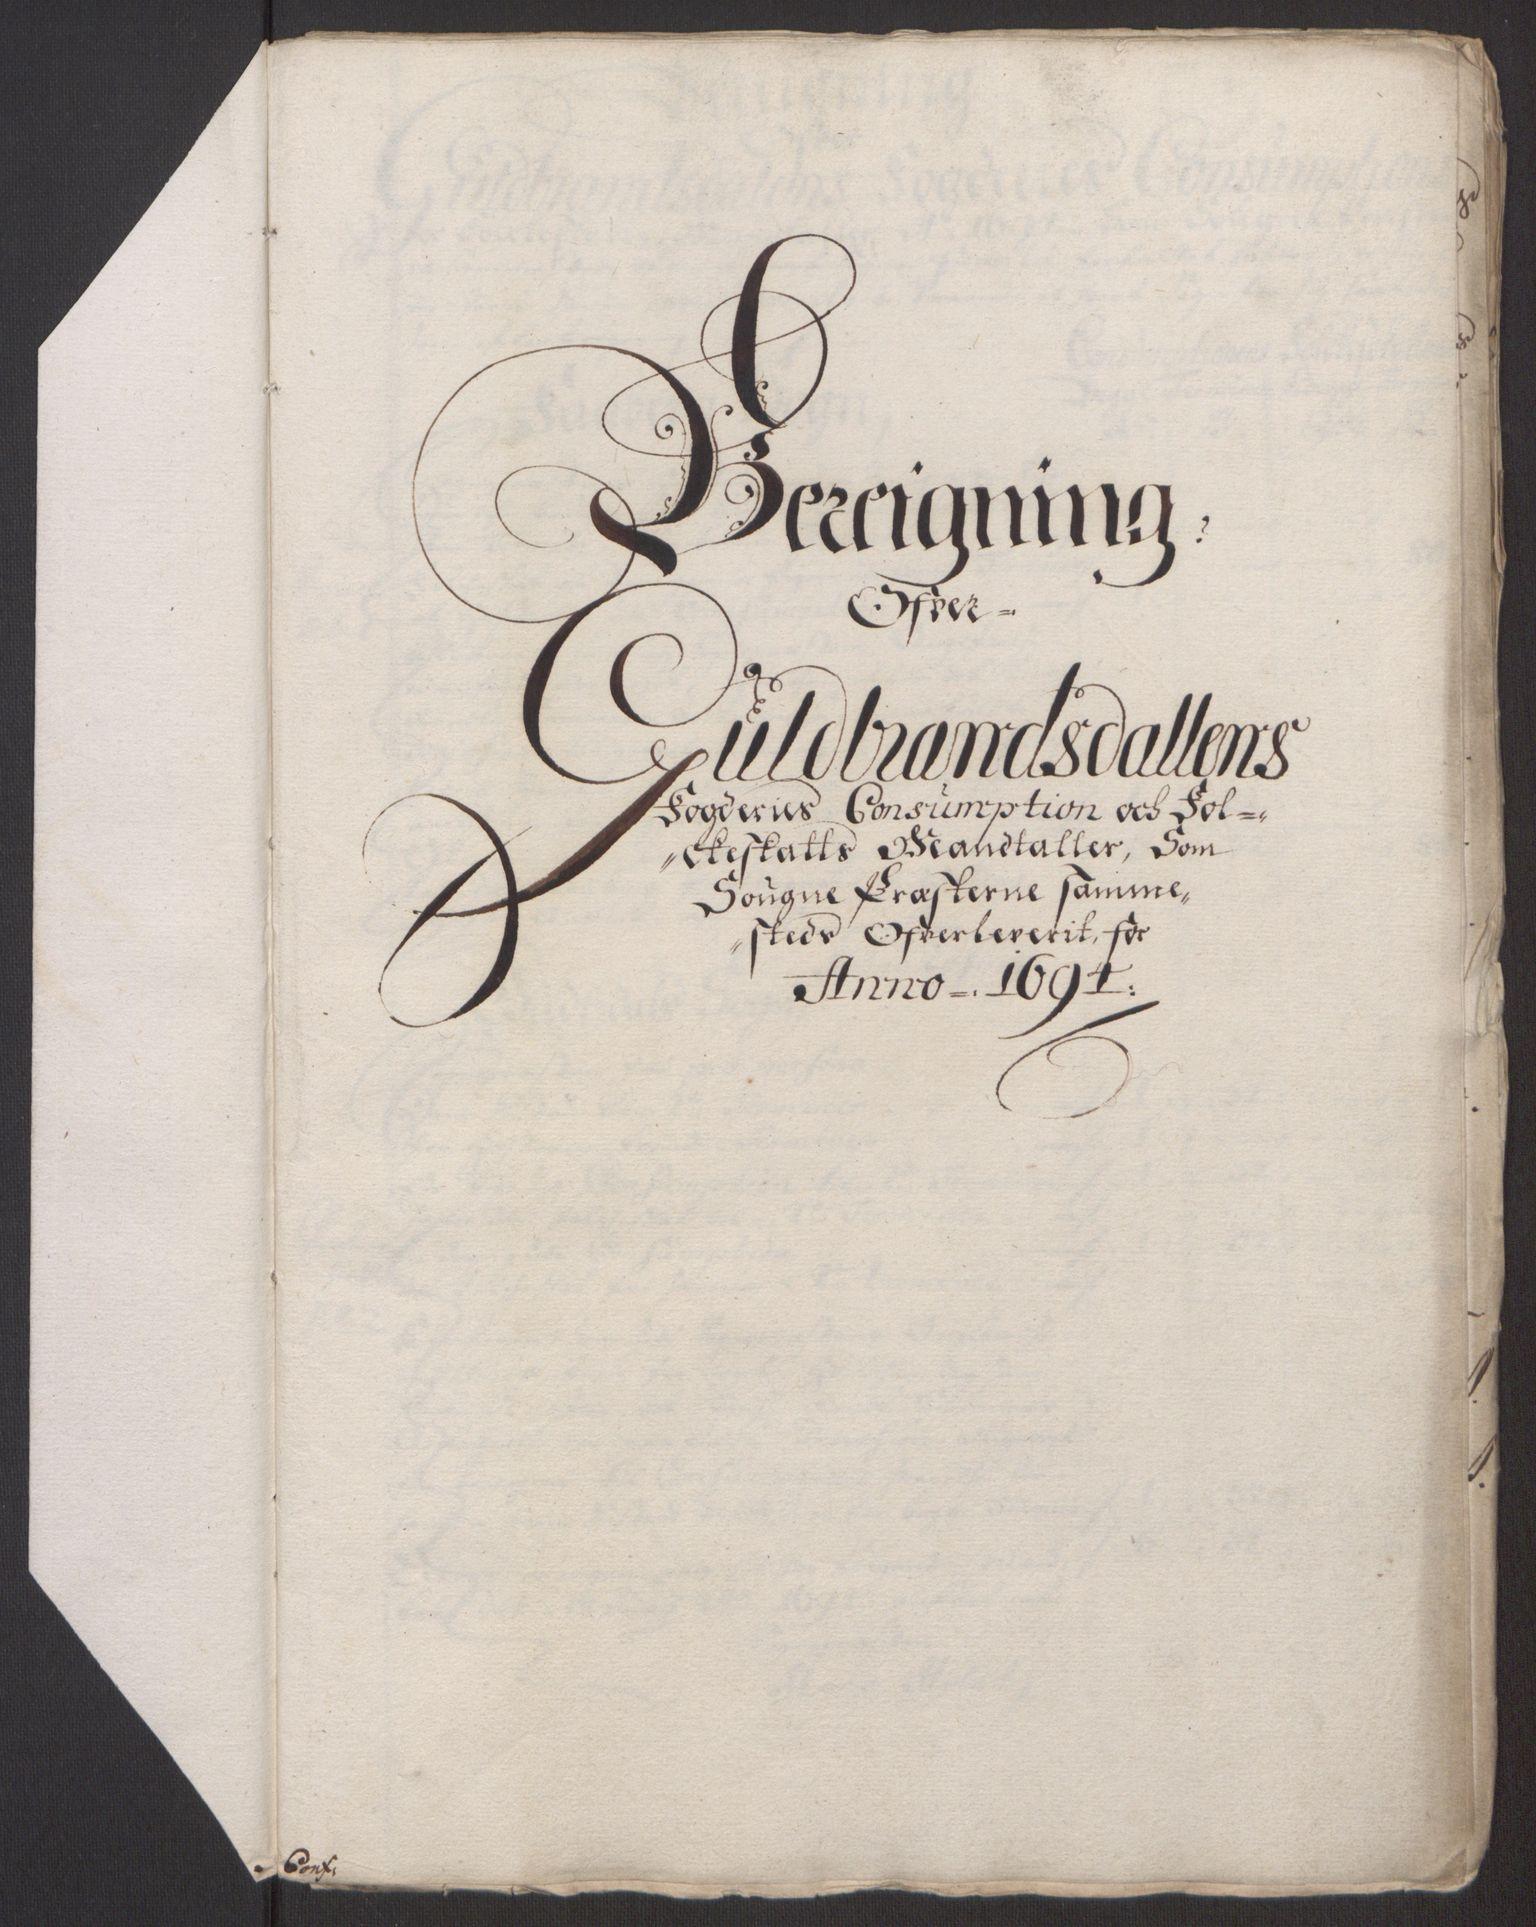 RA, Rentekammeret inntil 1814, Reviderte regnskaper, Fogderegnskap, R17/L1168: Fogderegnskap Gudbrandsdal, 1694, s. 339